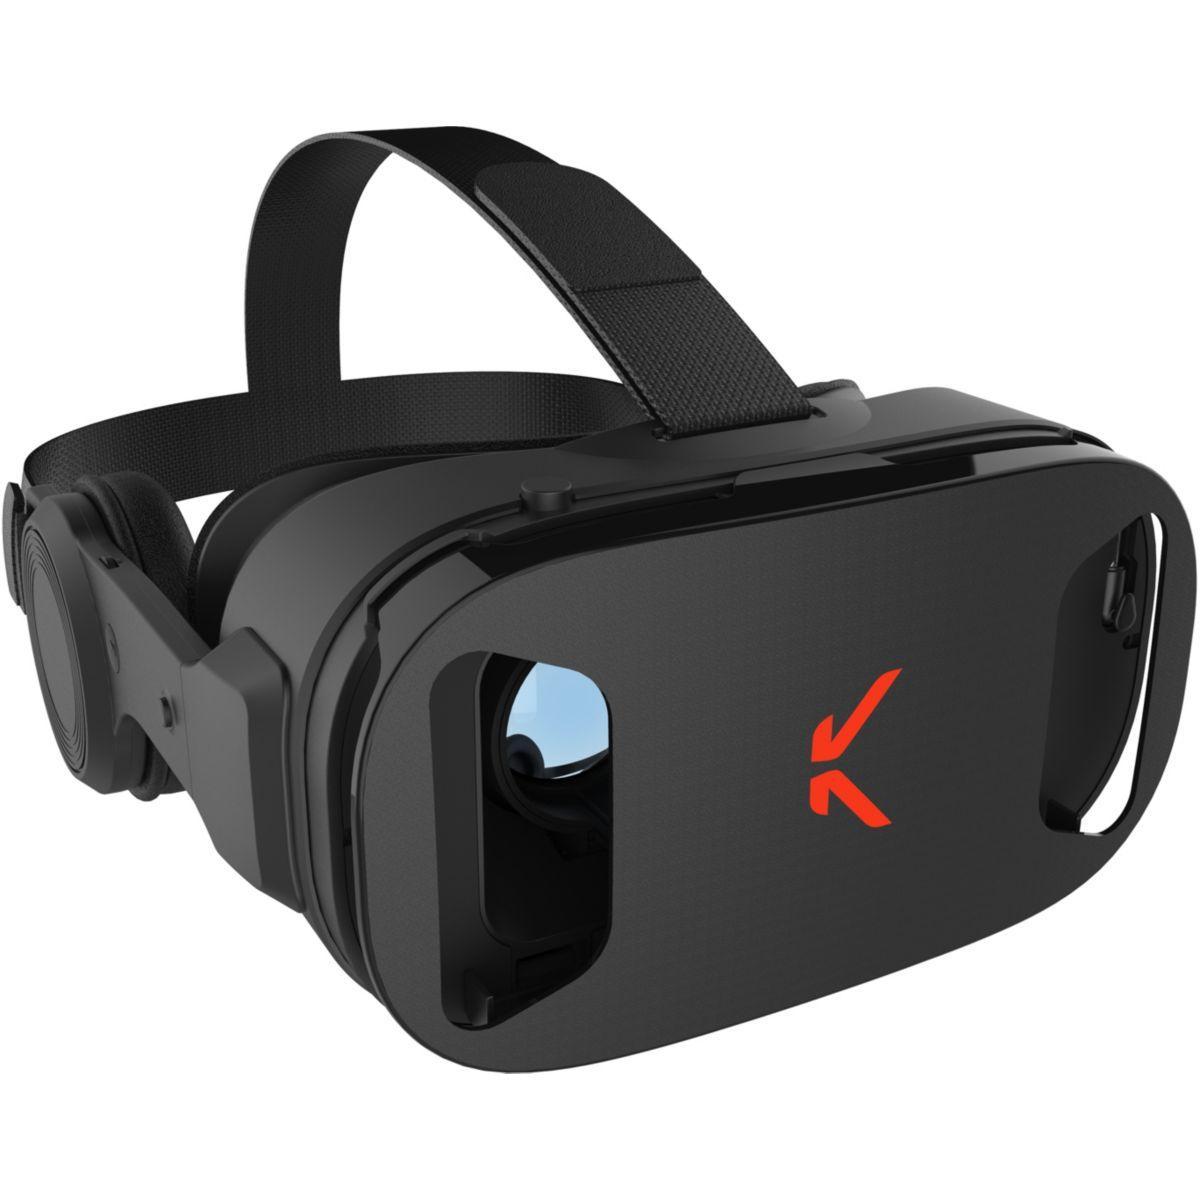 Casque de r�alit� virtuelle skillkorp vr10 (photo)